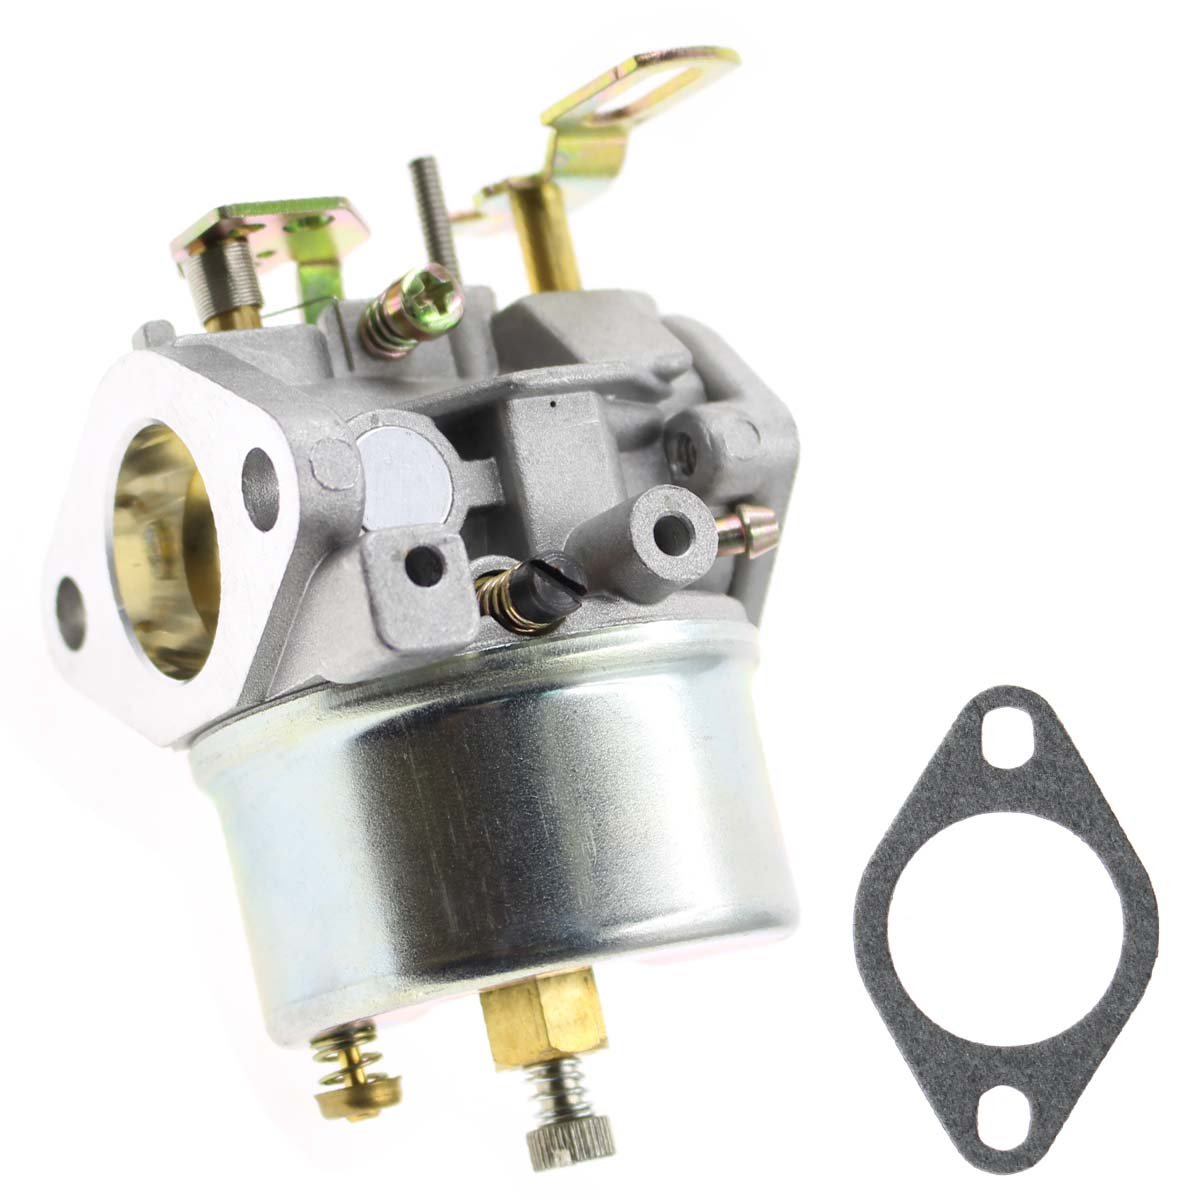 AUTOKAY Adjustable Carburetor for Tecumseh 8HP 9HP 10HP Snowblower 640349 640052 640054